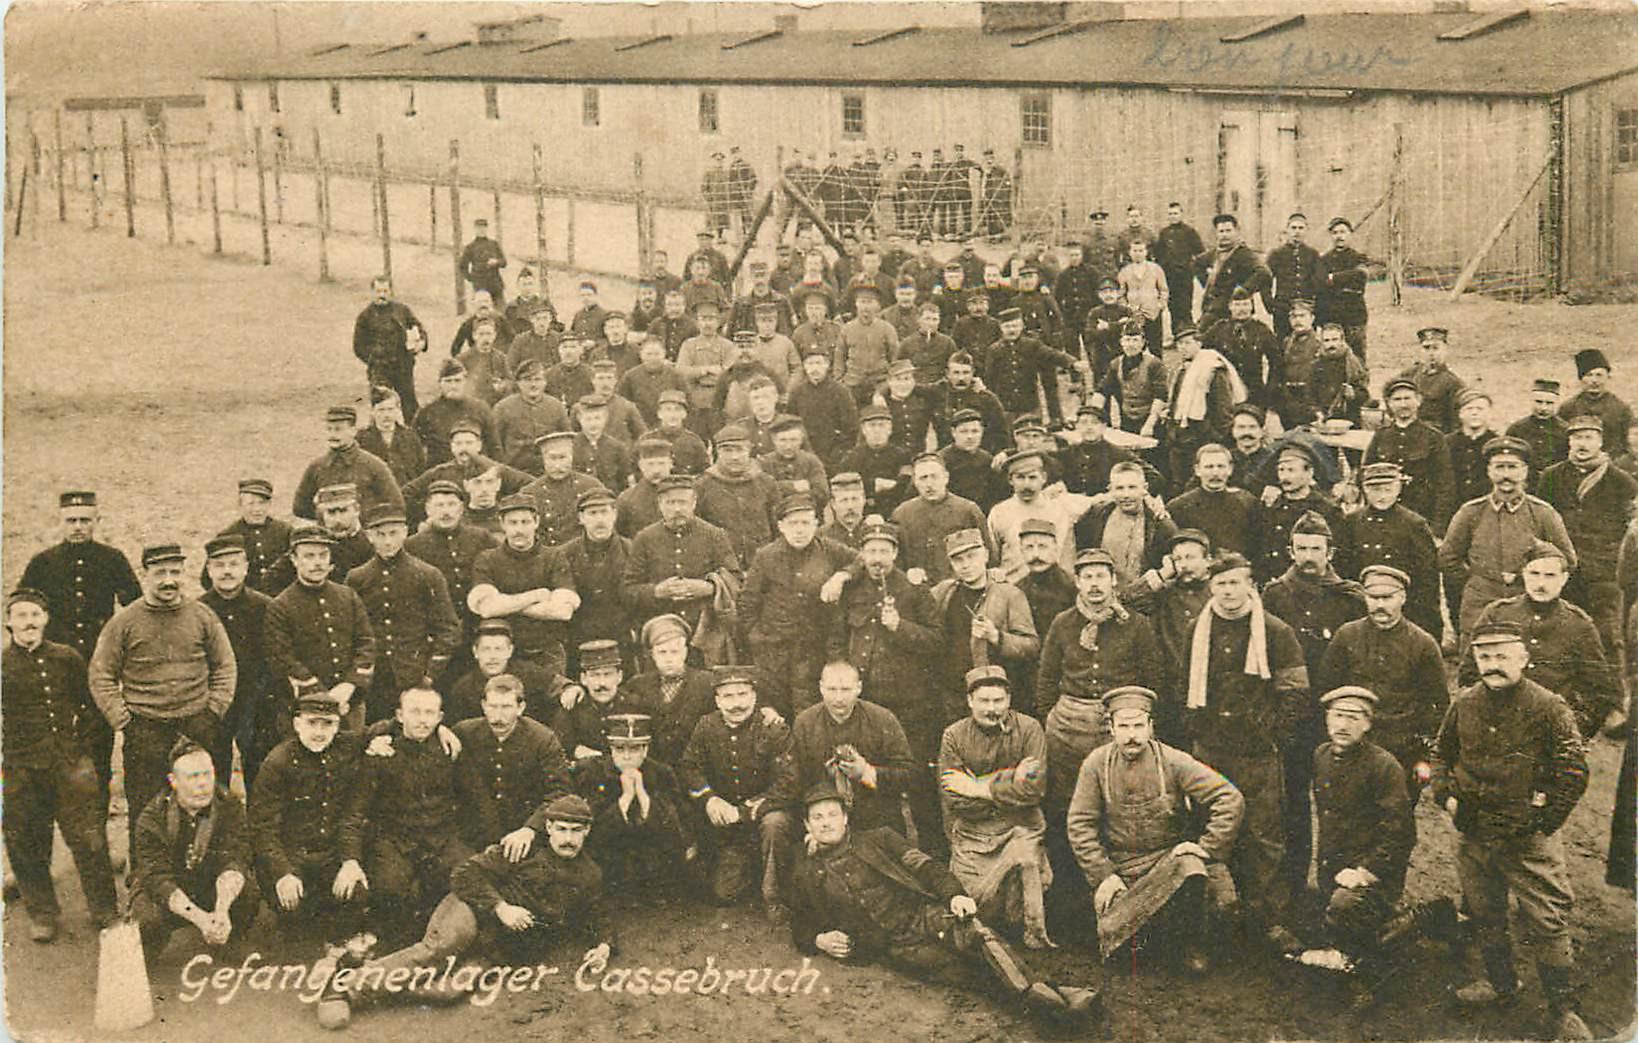 WW SOLTAU. Gefangehenlager Cassebruch 1916 Camp de Prisonniers de Guerre